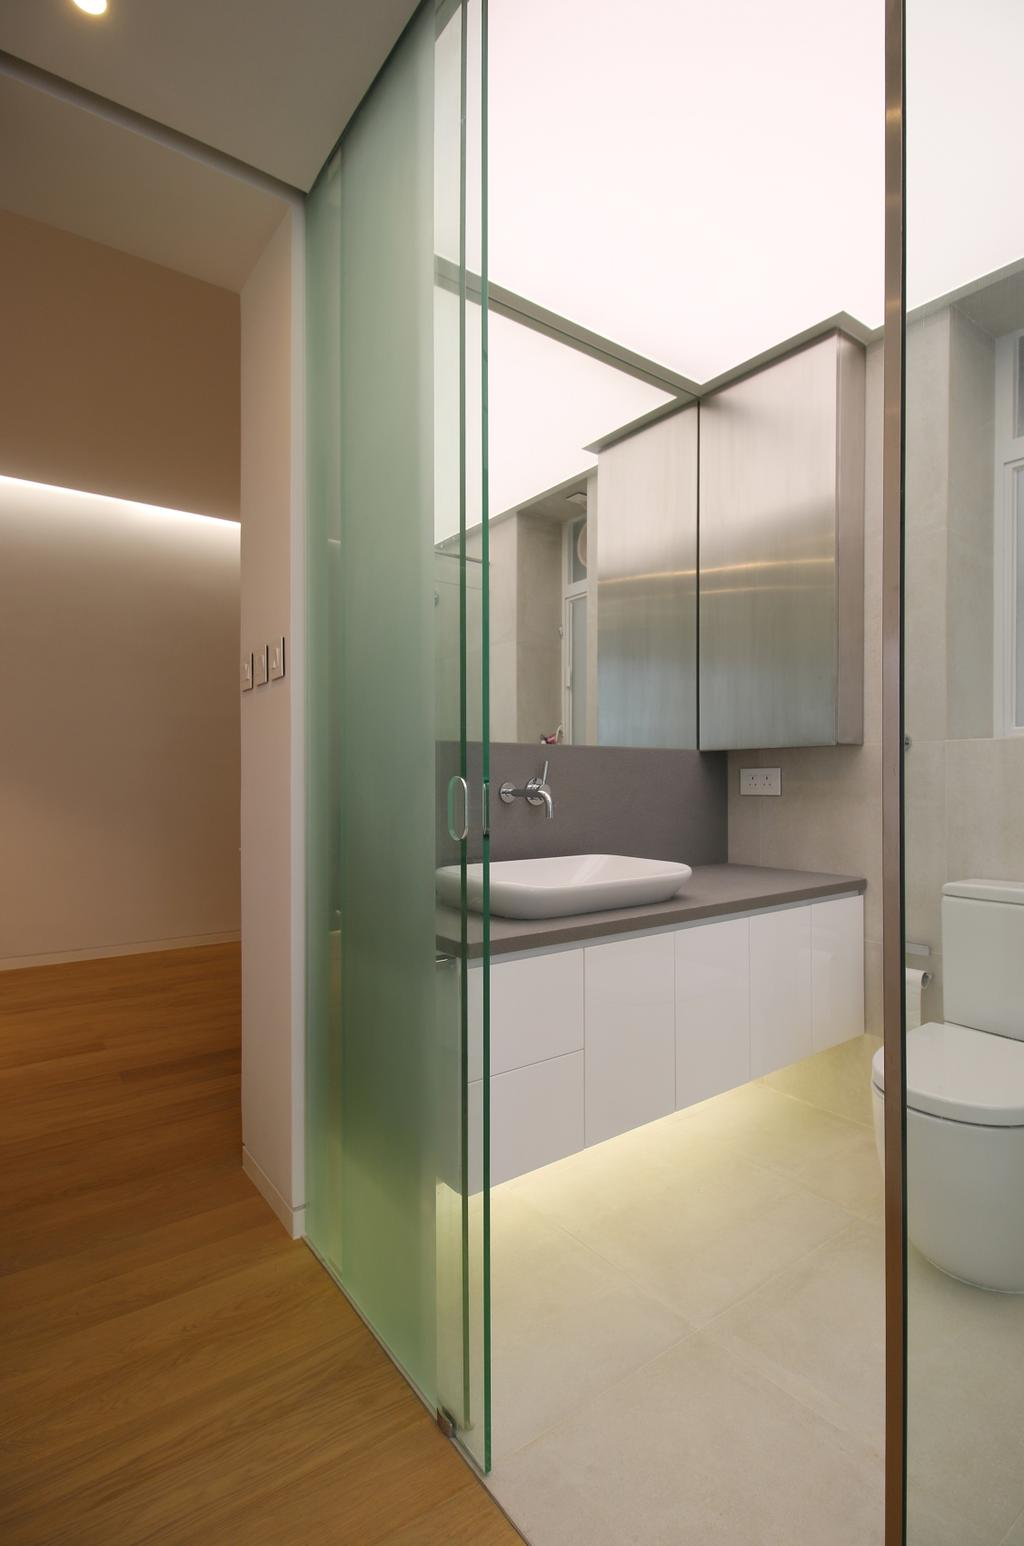 摩登, 私家樓, 浴室, 逸樺園, 室內設計師, EMCS, 簡約, Indoors, Interior Design, Room